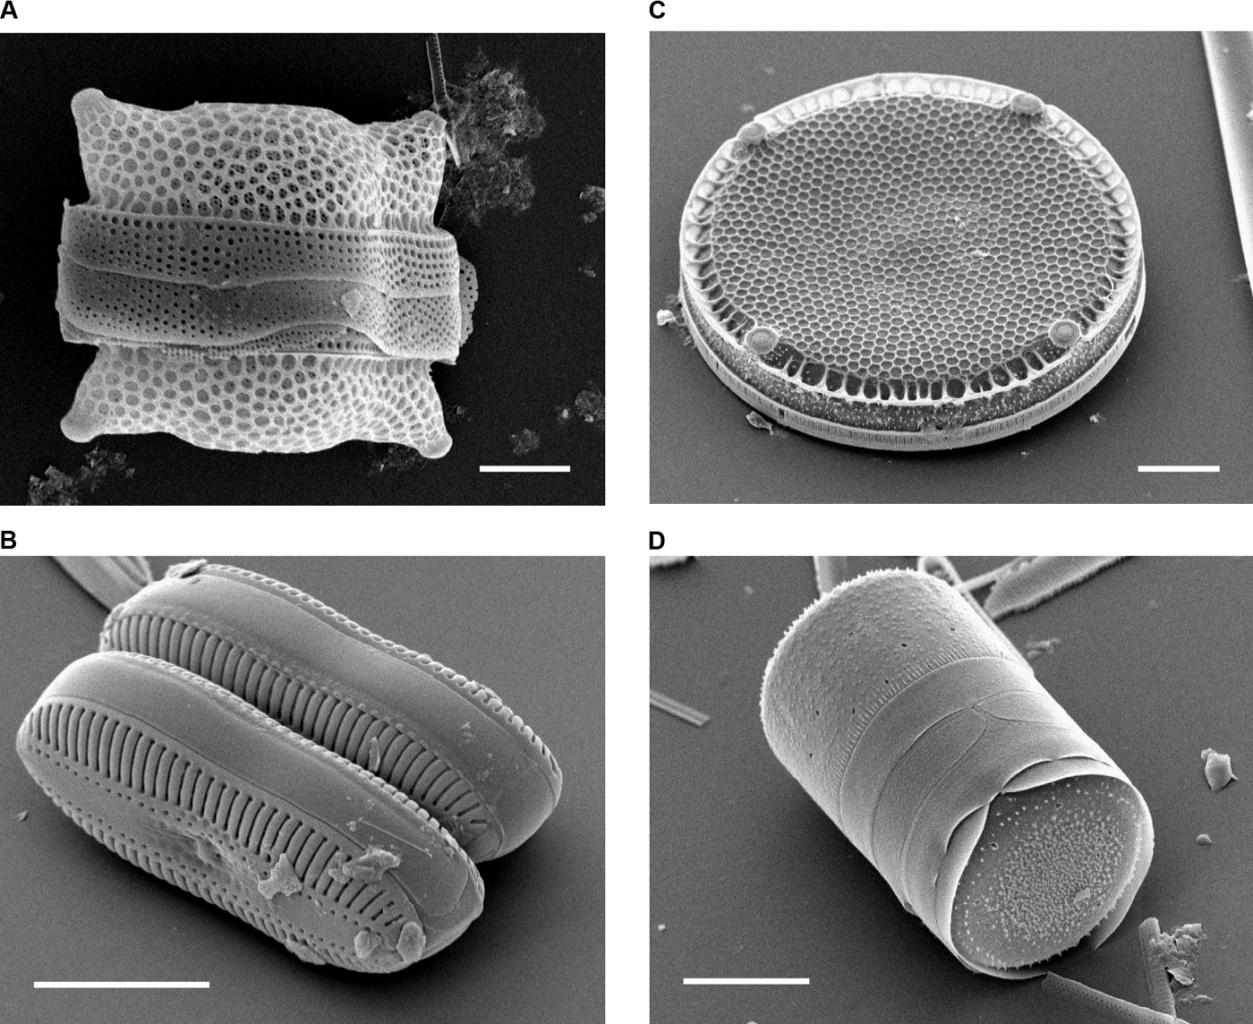 Image: 4 different diatoms